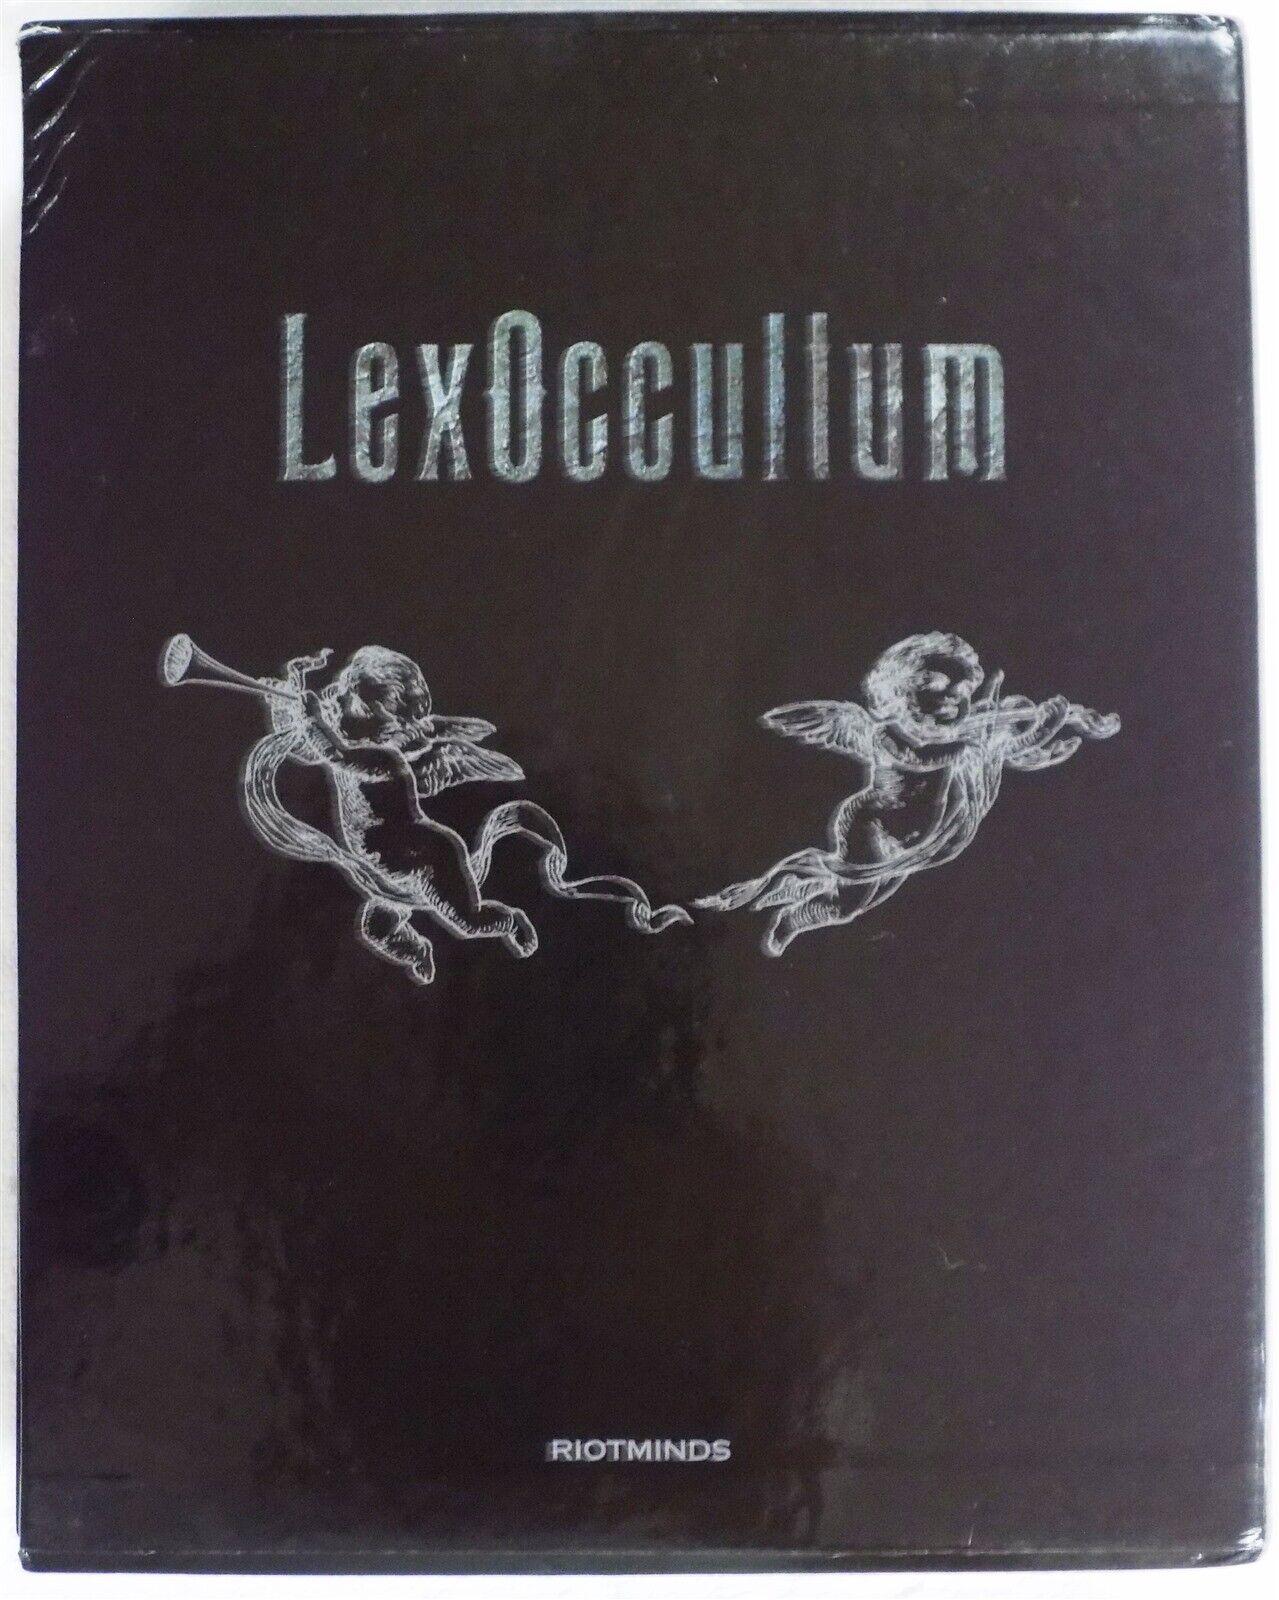 Riotminds historia alternativa granada de cohete propulsado lexoccultum (kickEstrellater Edition) Caja justo